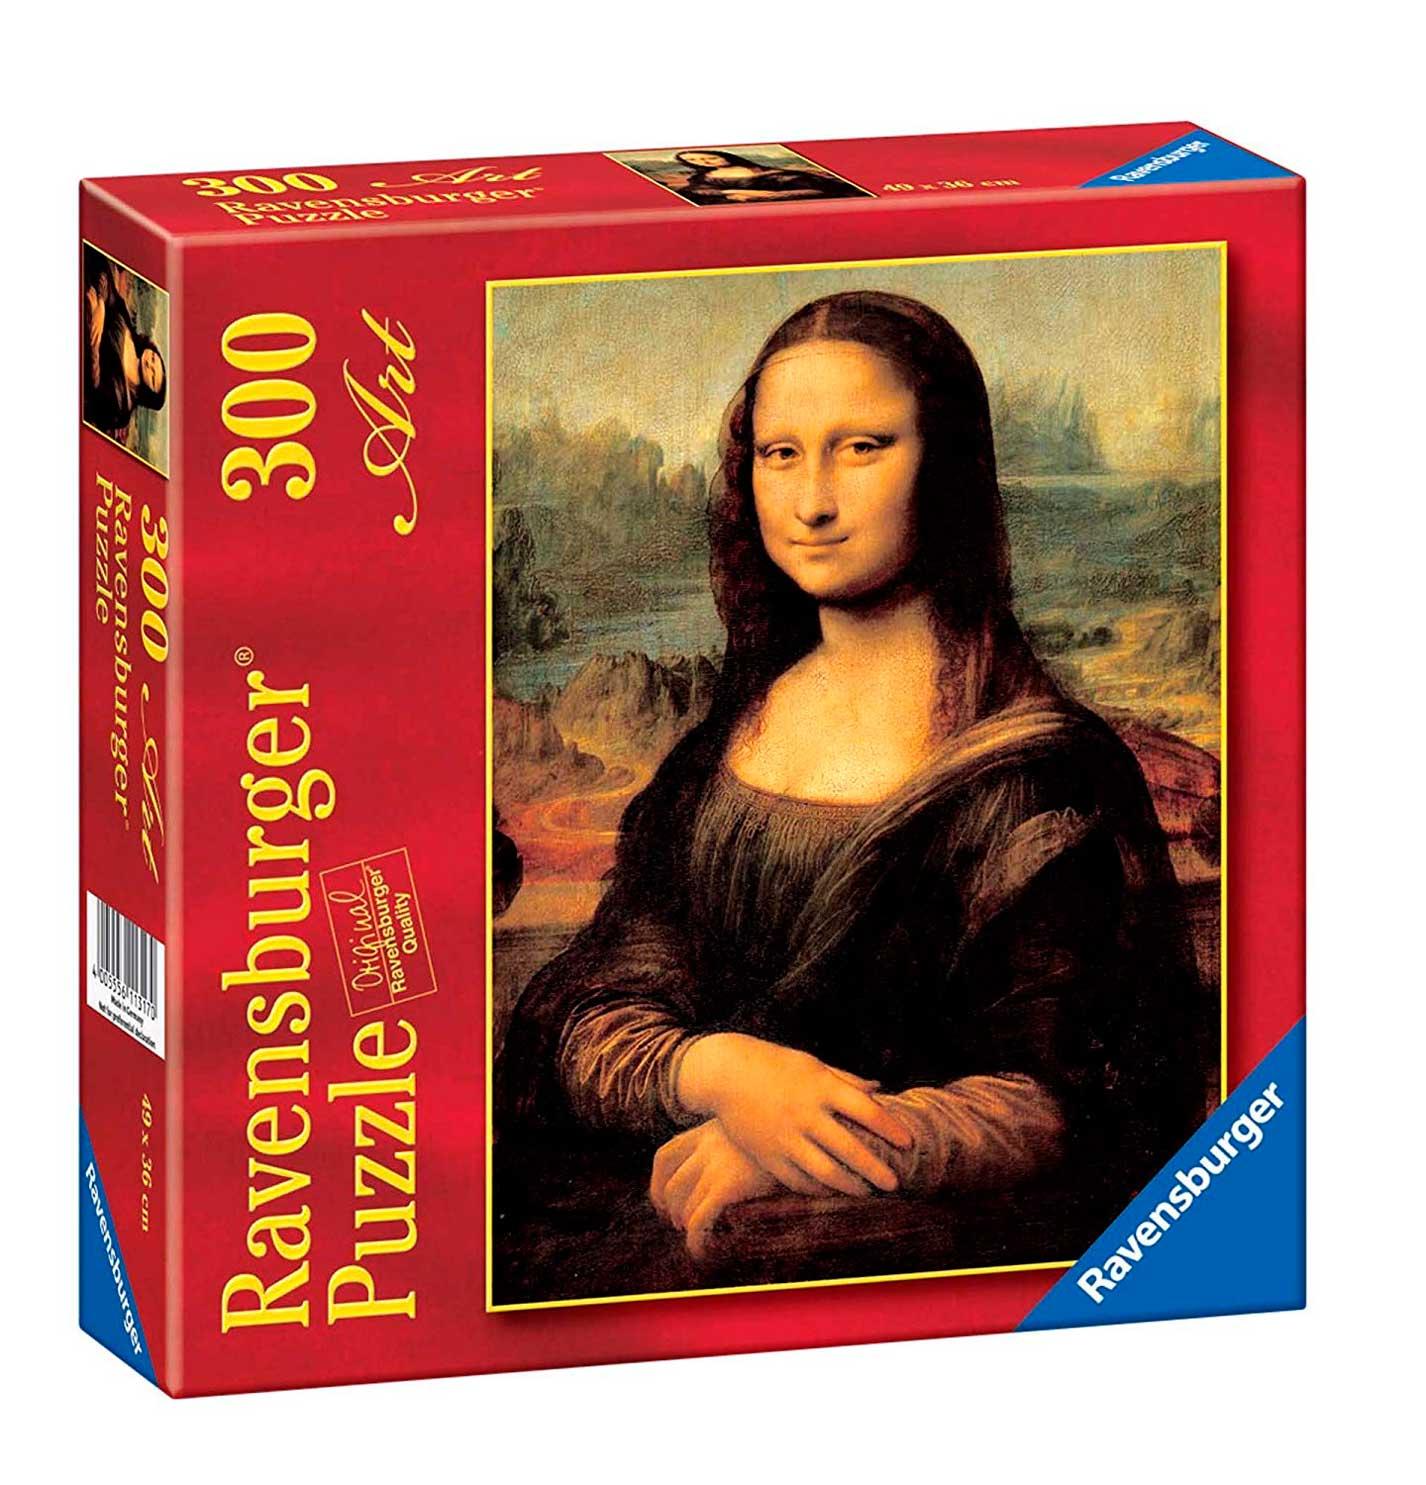 Puzzle Ravensburger Mona Lisa, de Da Vinci de 300 Piezas